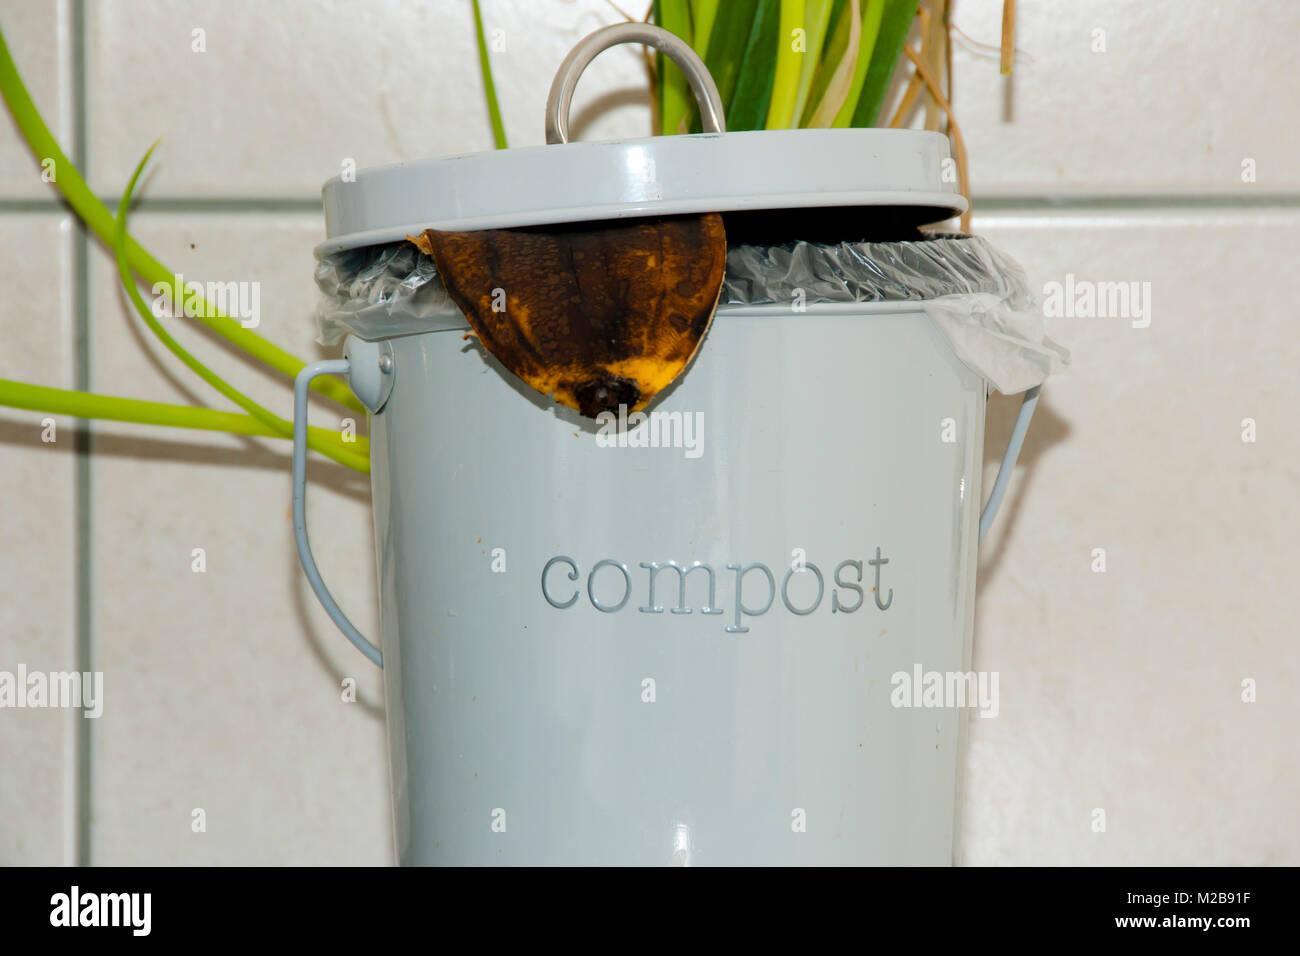 Food Compost Bin Stock Photos & Food Compost Bin Stock Images - Alamy